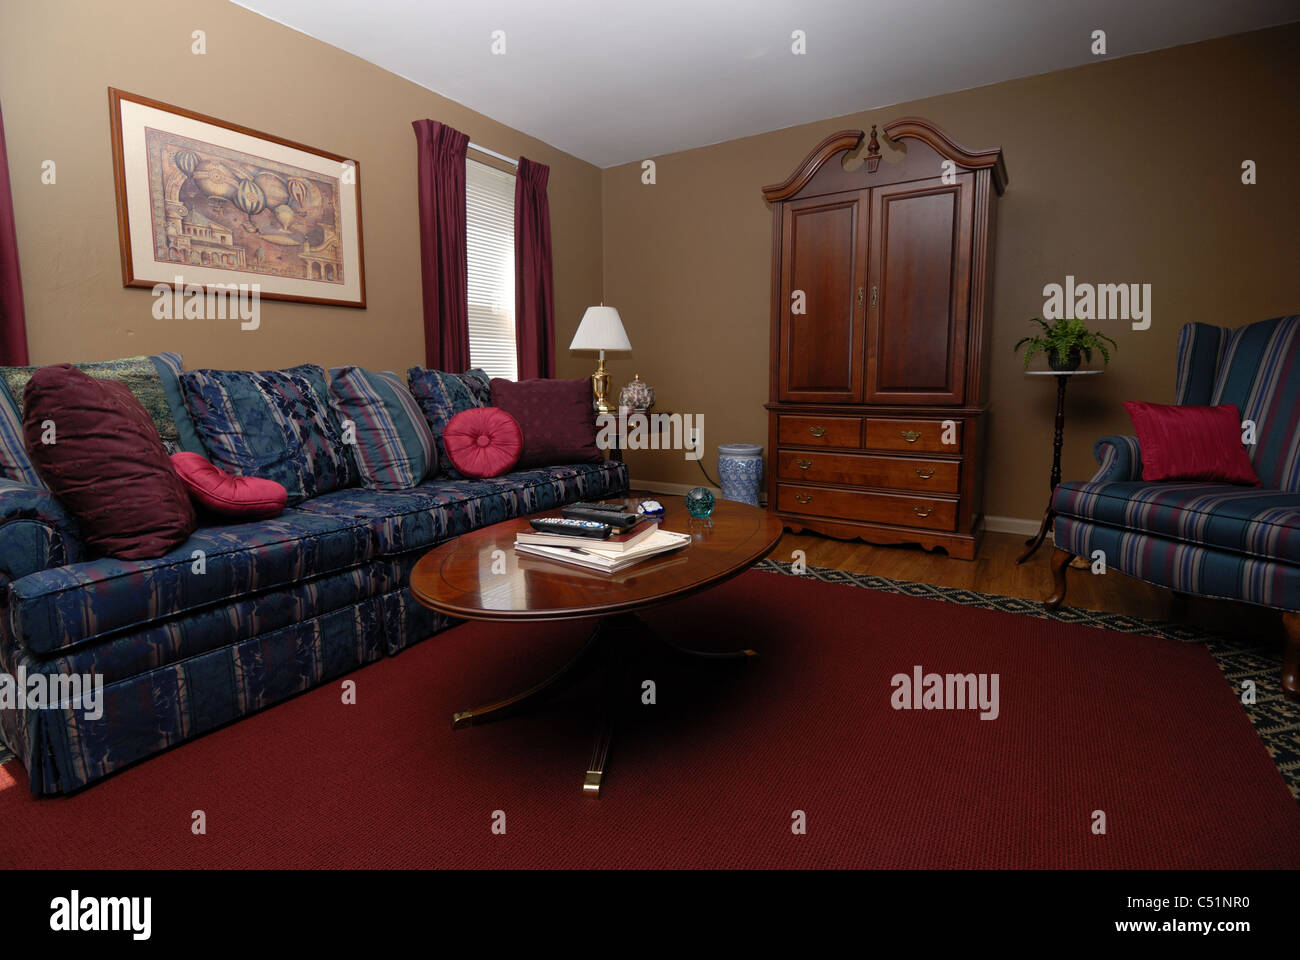 Wide Angle Shot Interior Home Stockfotos & Wide Angle Shot Interior ...